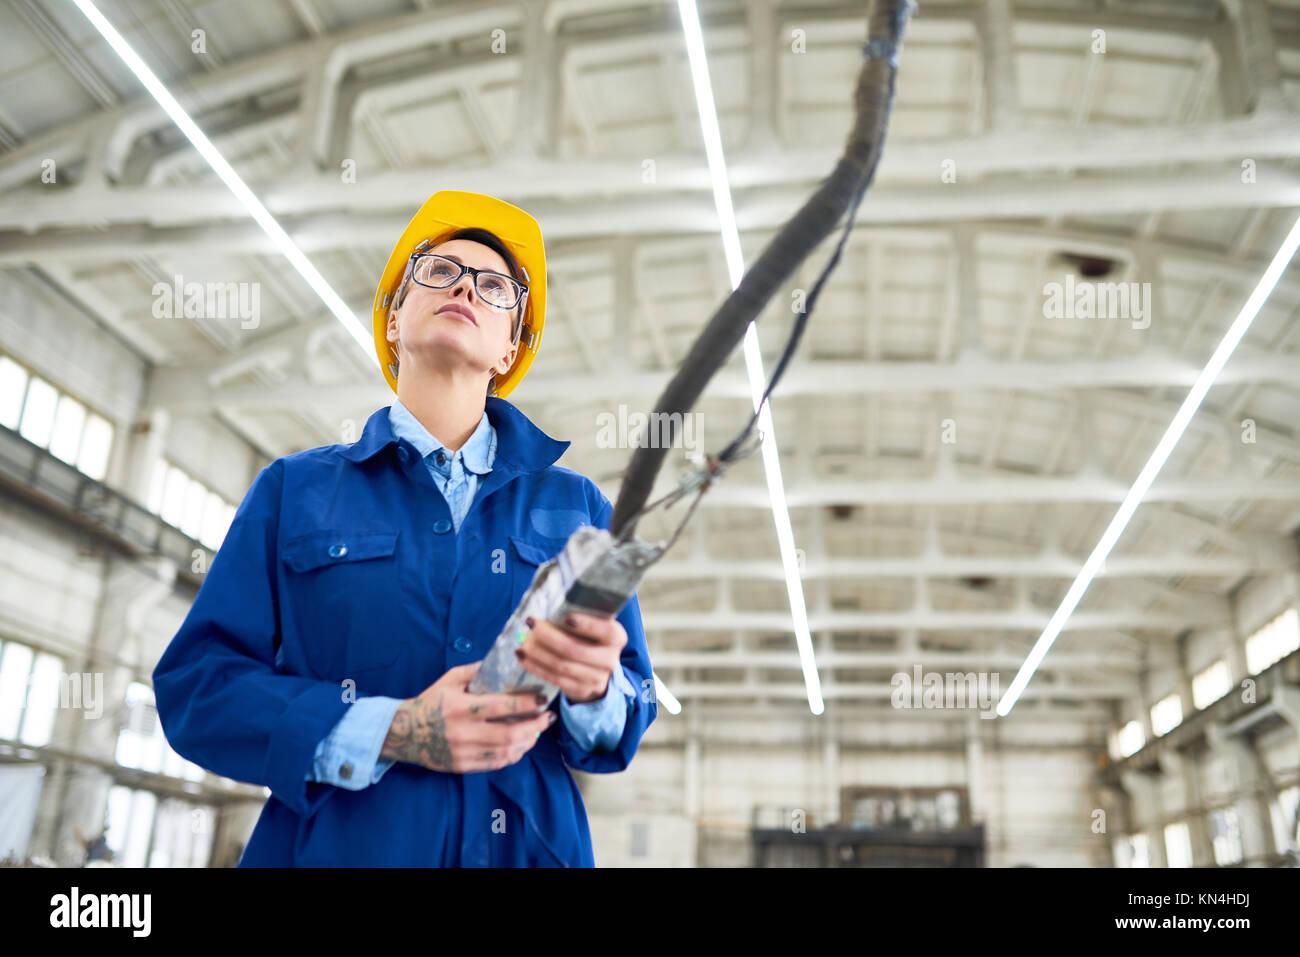 Portrait of Pretty Machine Operator at Work - Stock Image